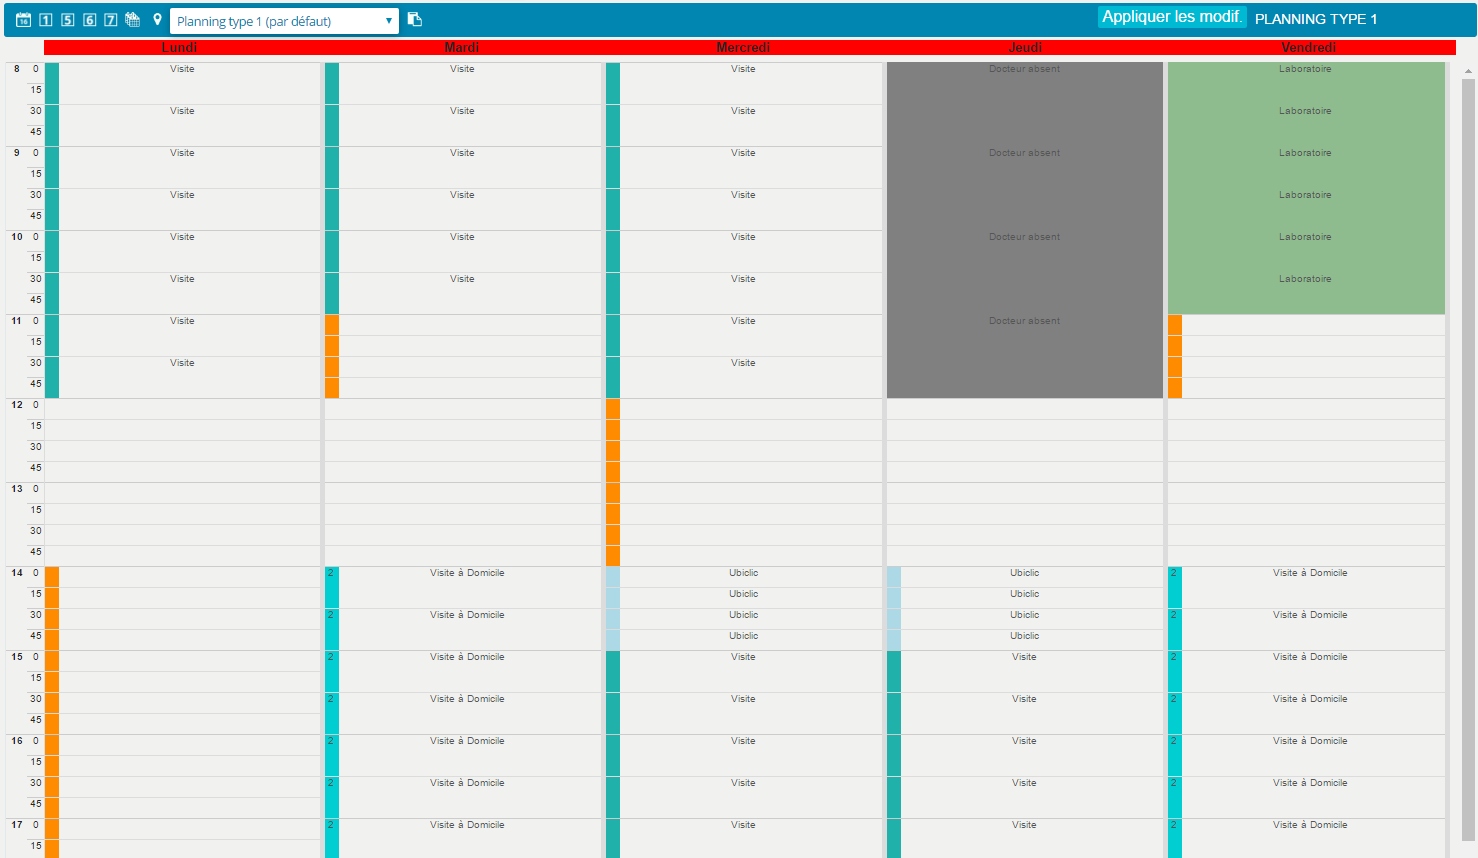 Planning type